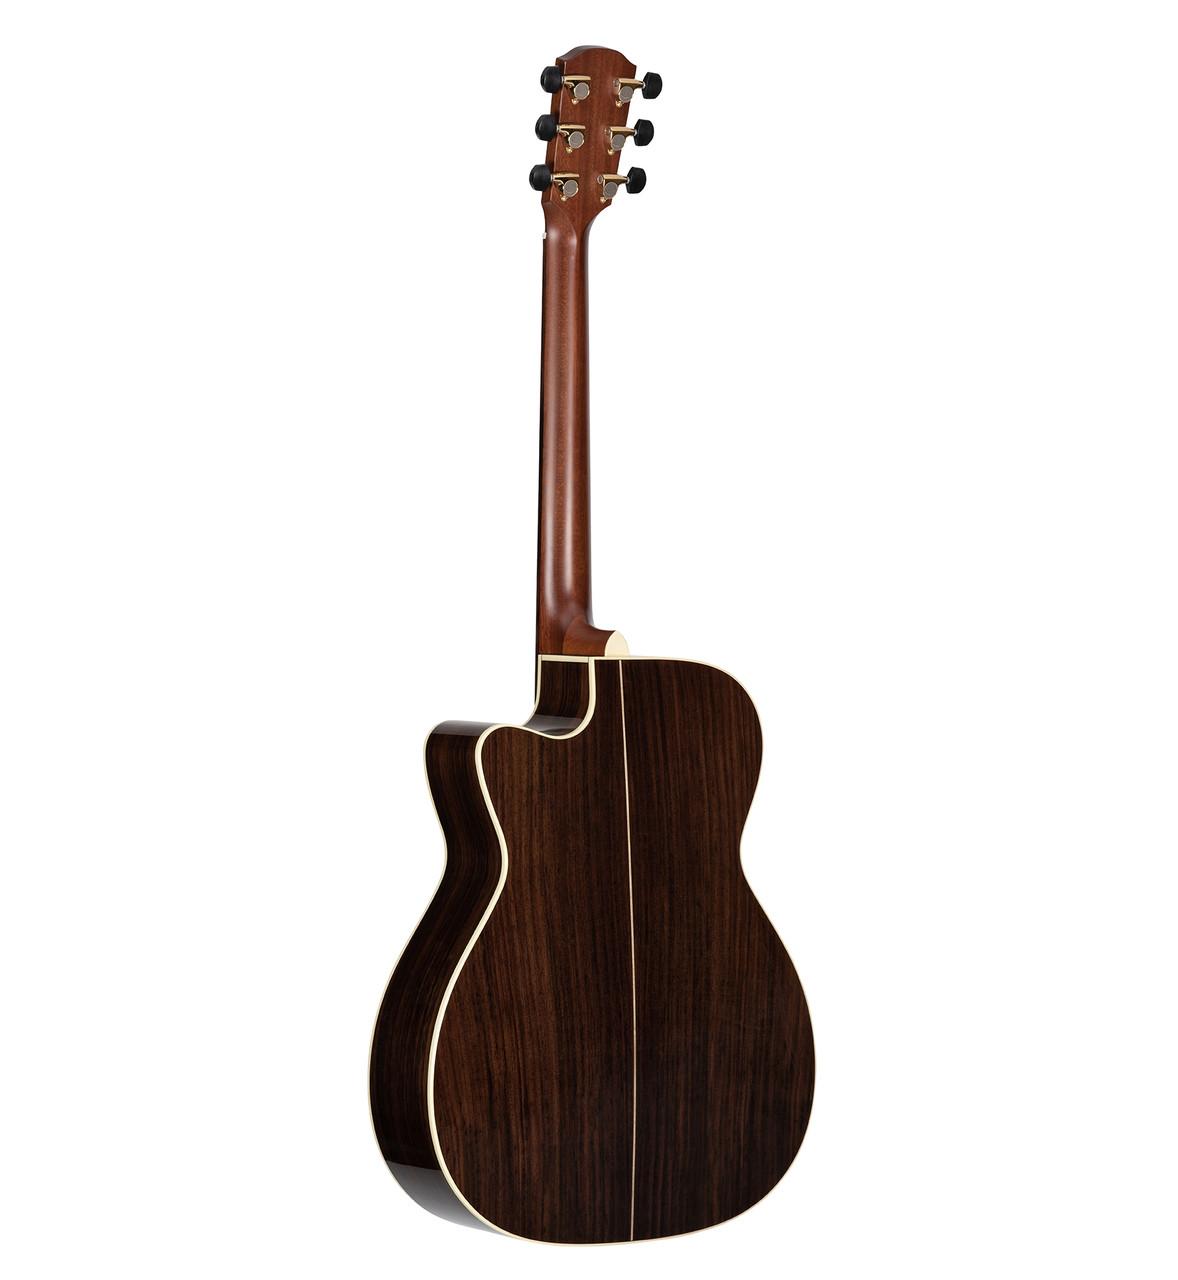 Alvarez Yairi FYM70CE Masterworks OM Acoustic Guitar